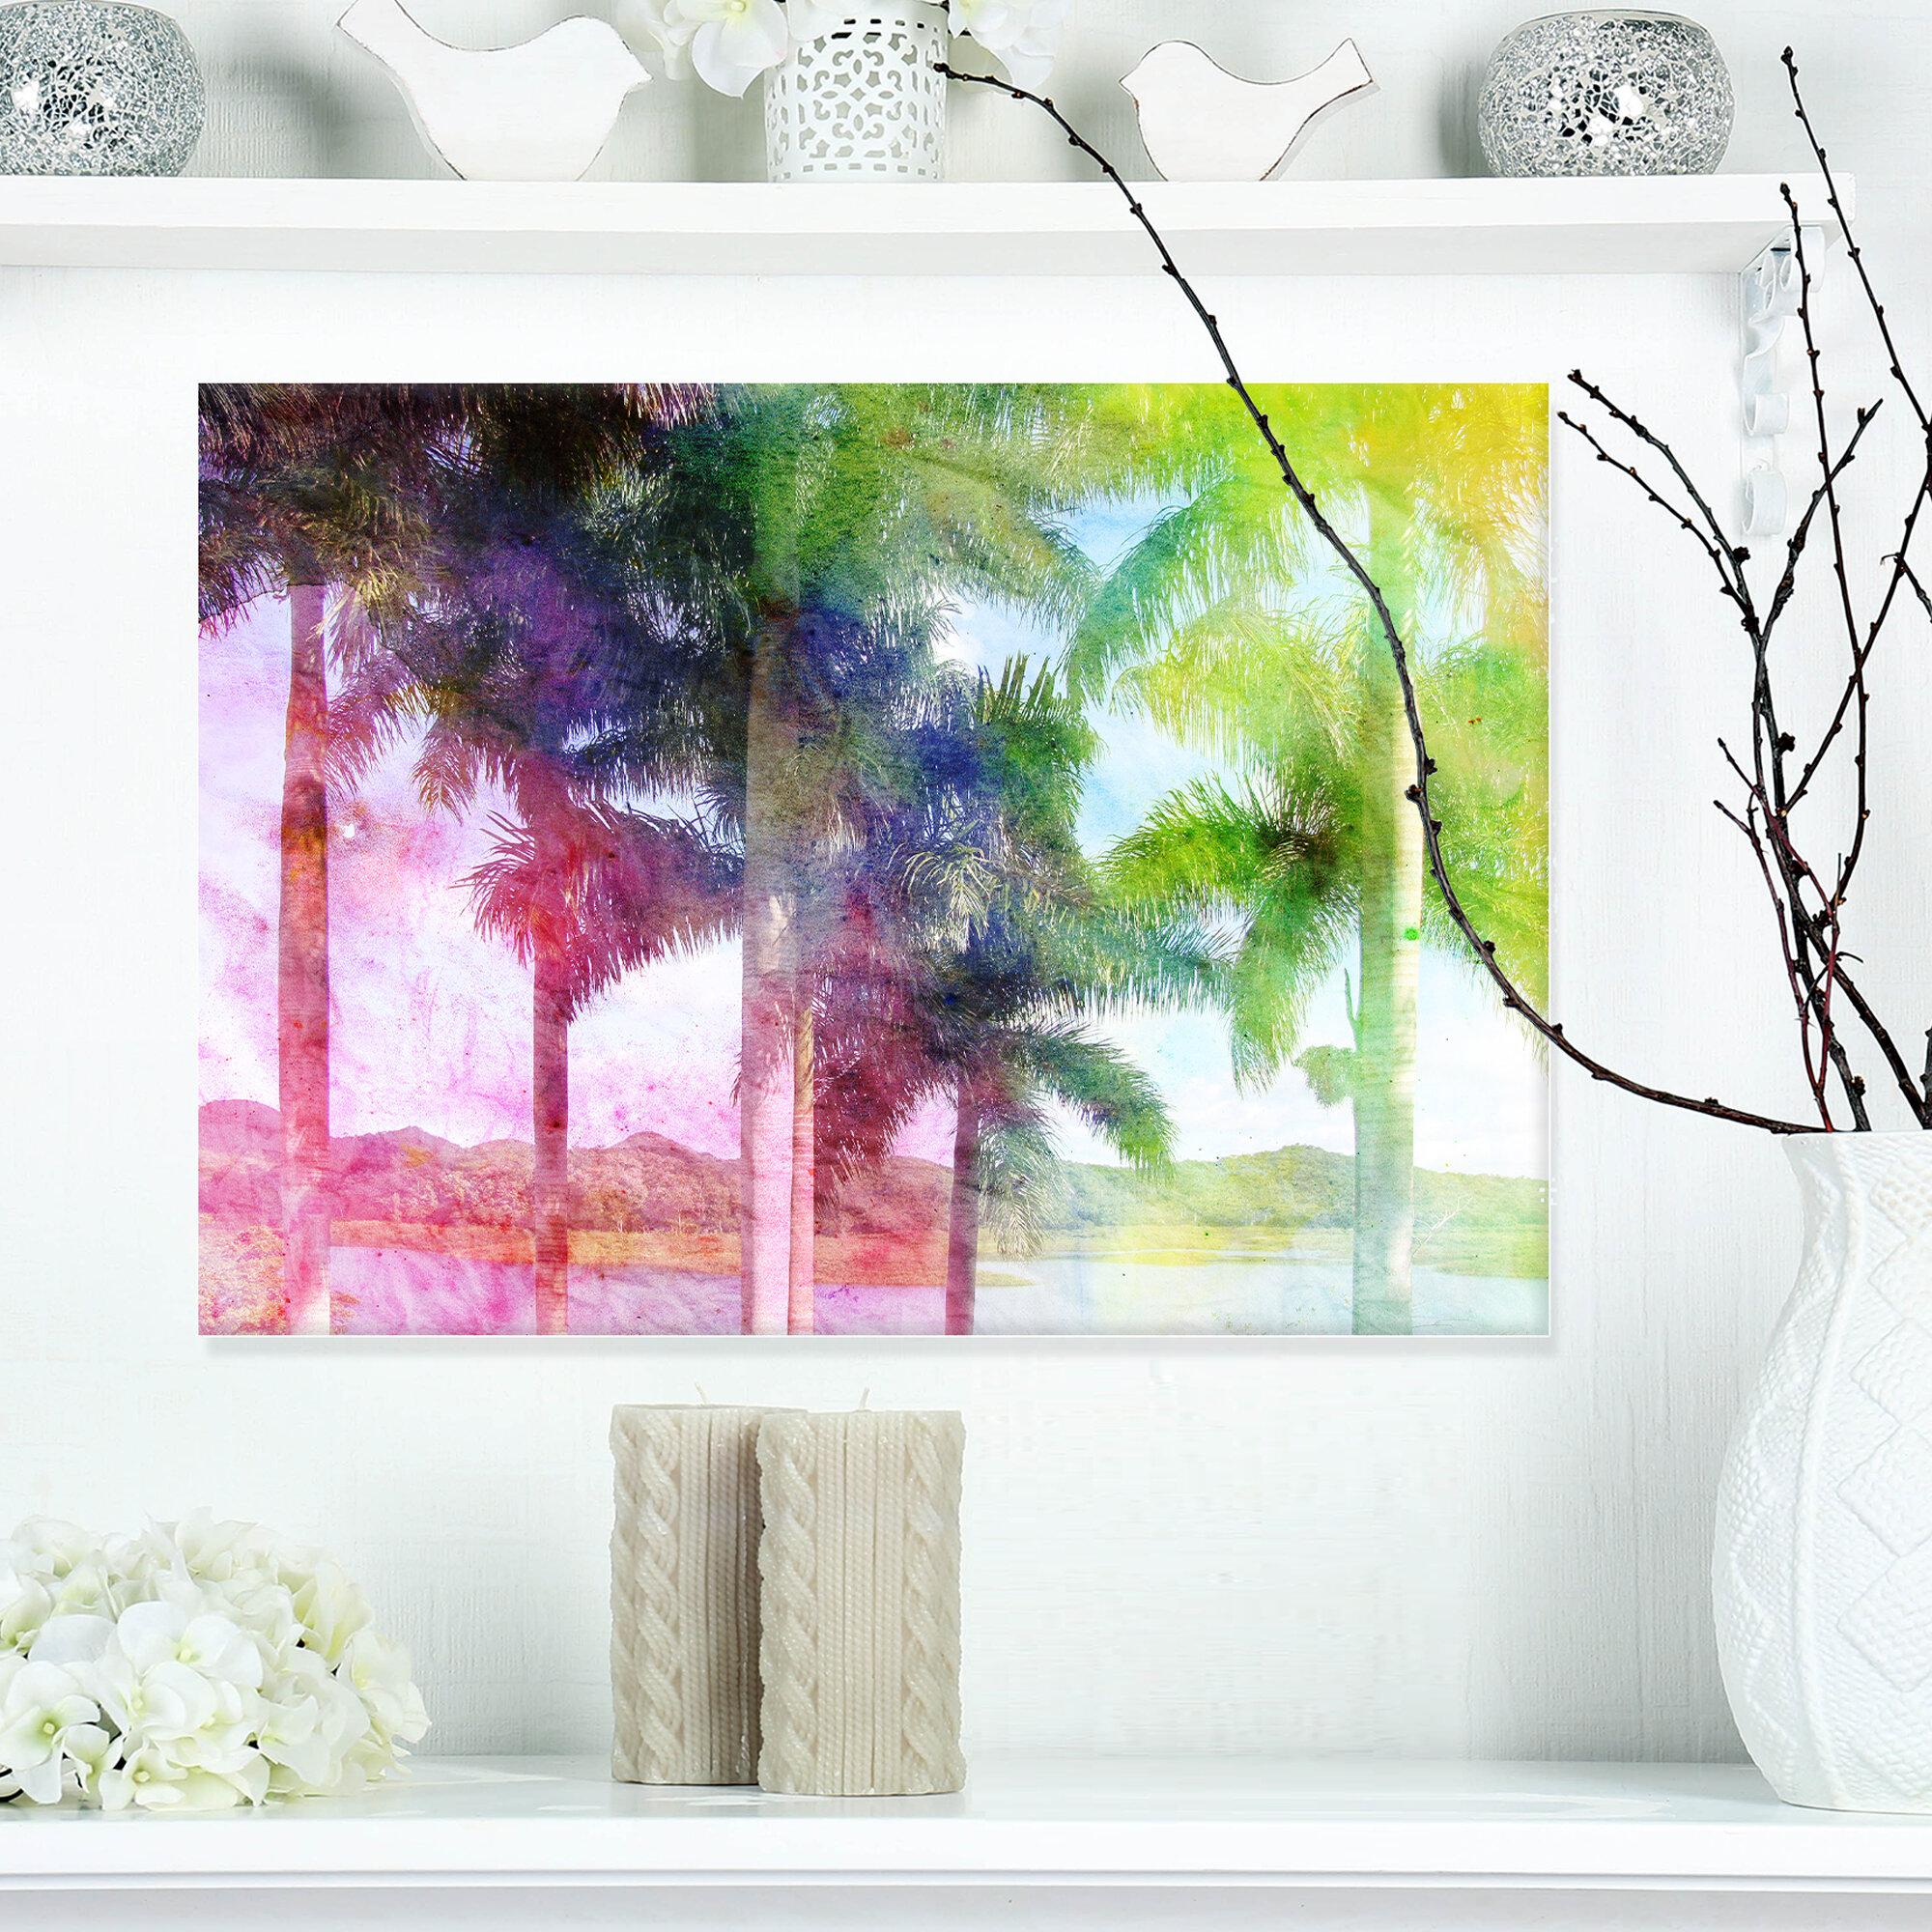 Artissimo Designs Printed Canvas Art | Wayfair